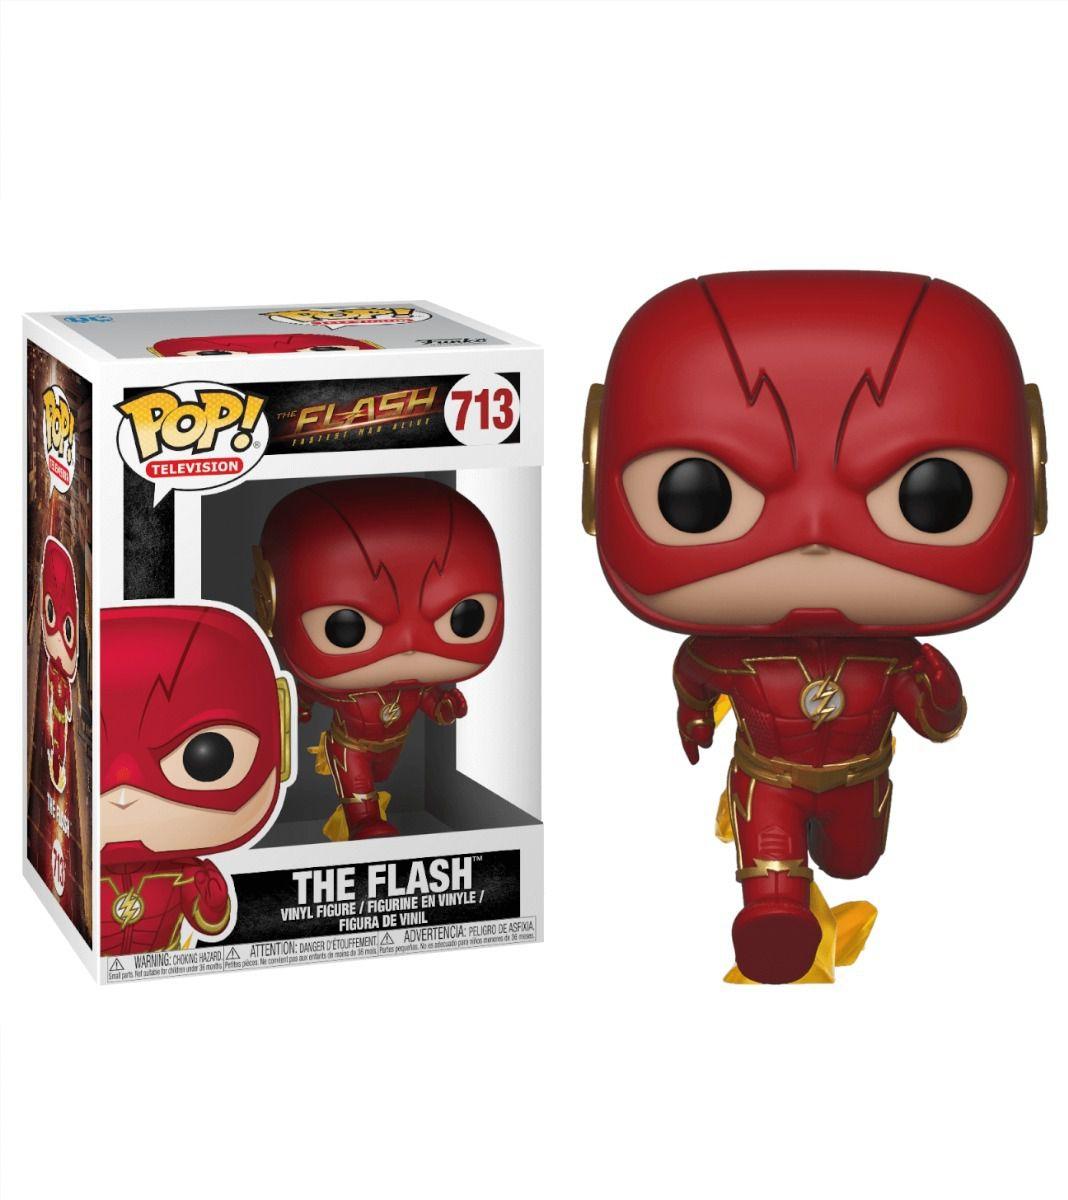 Funko Pop Flash: The Flash (Série) #713 - Funko